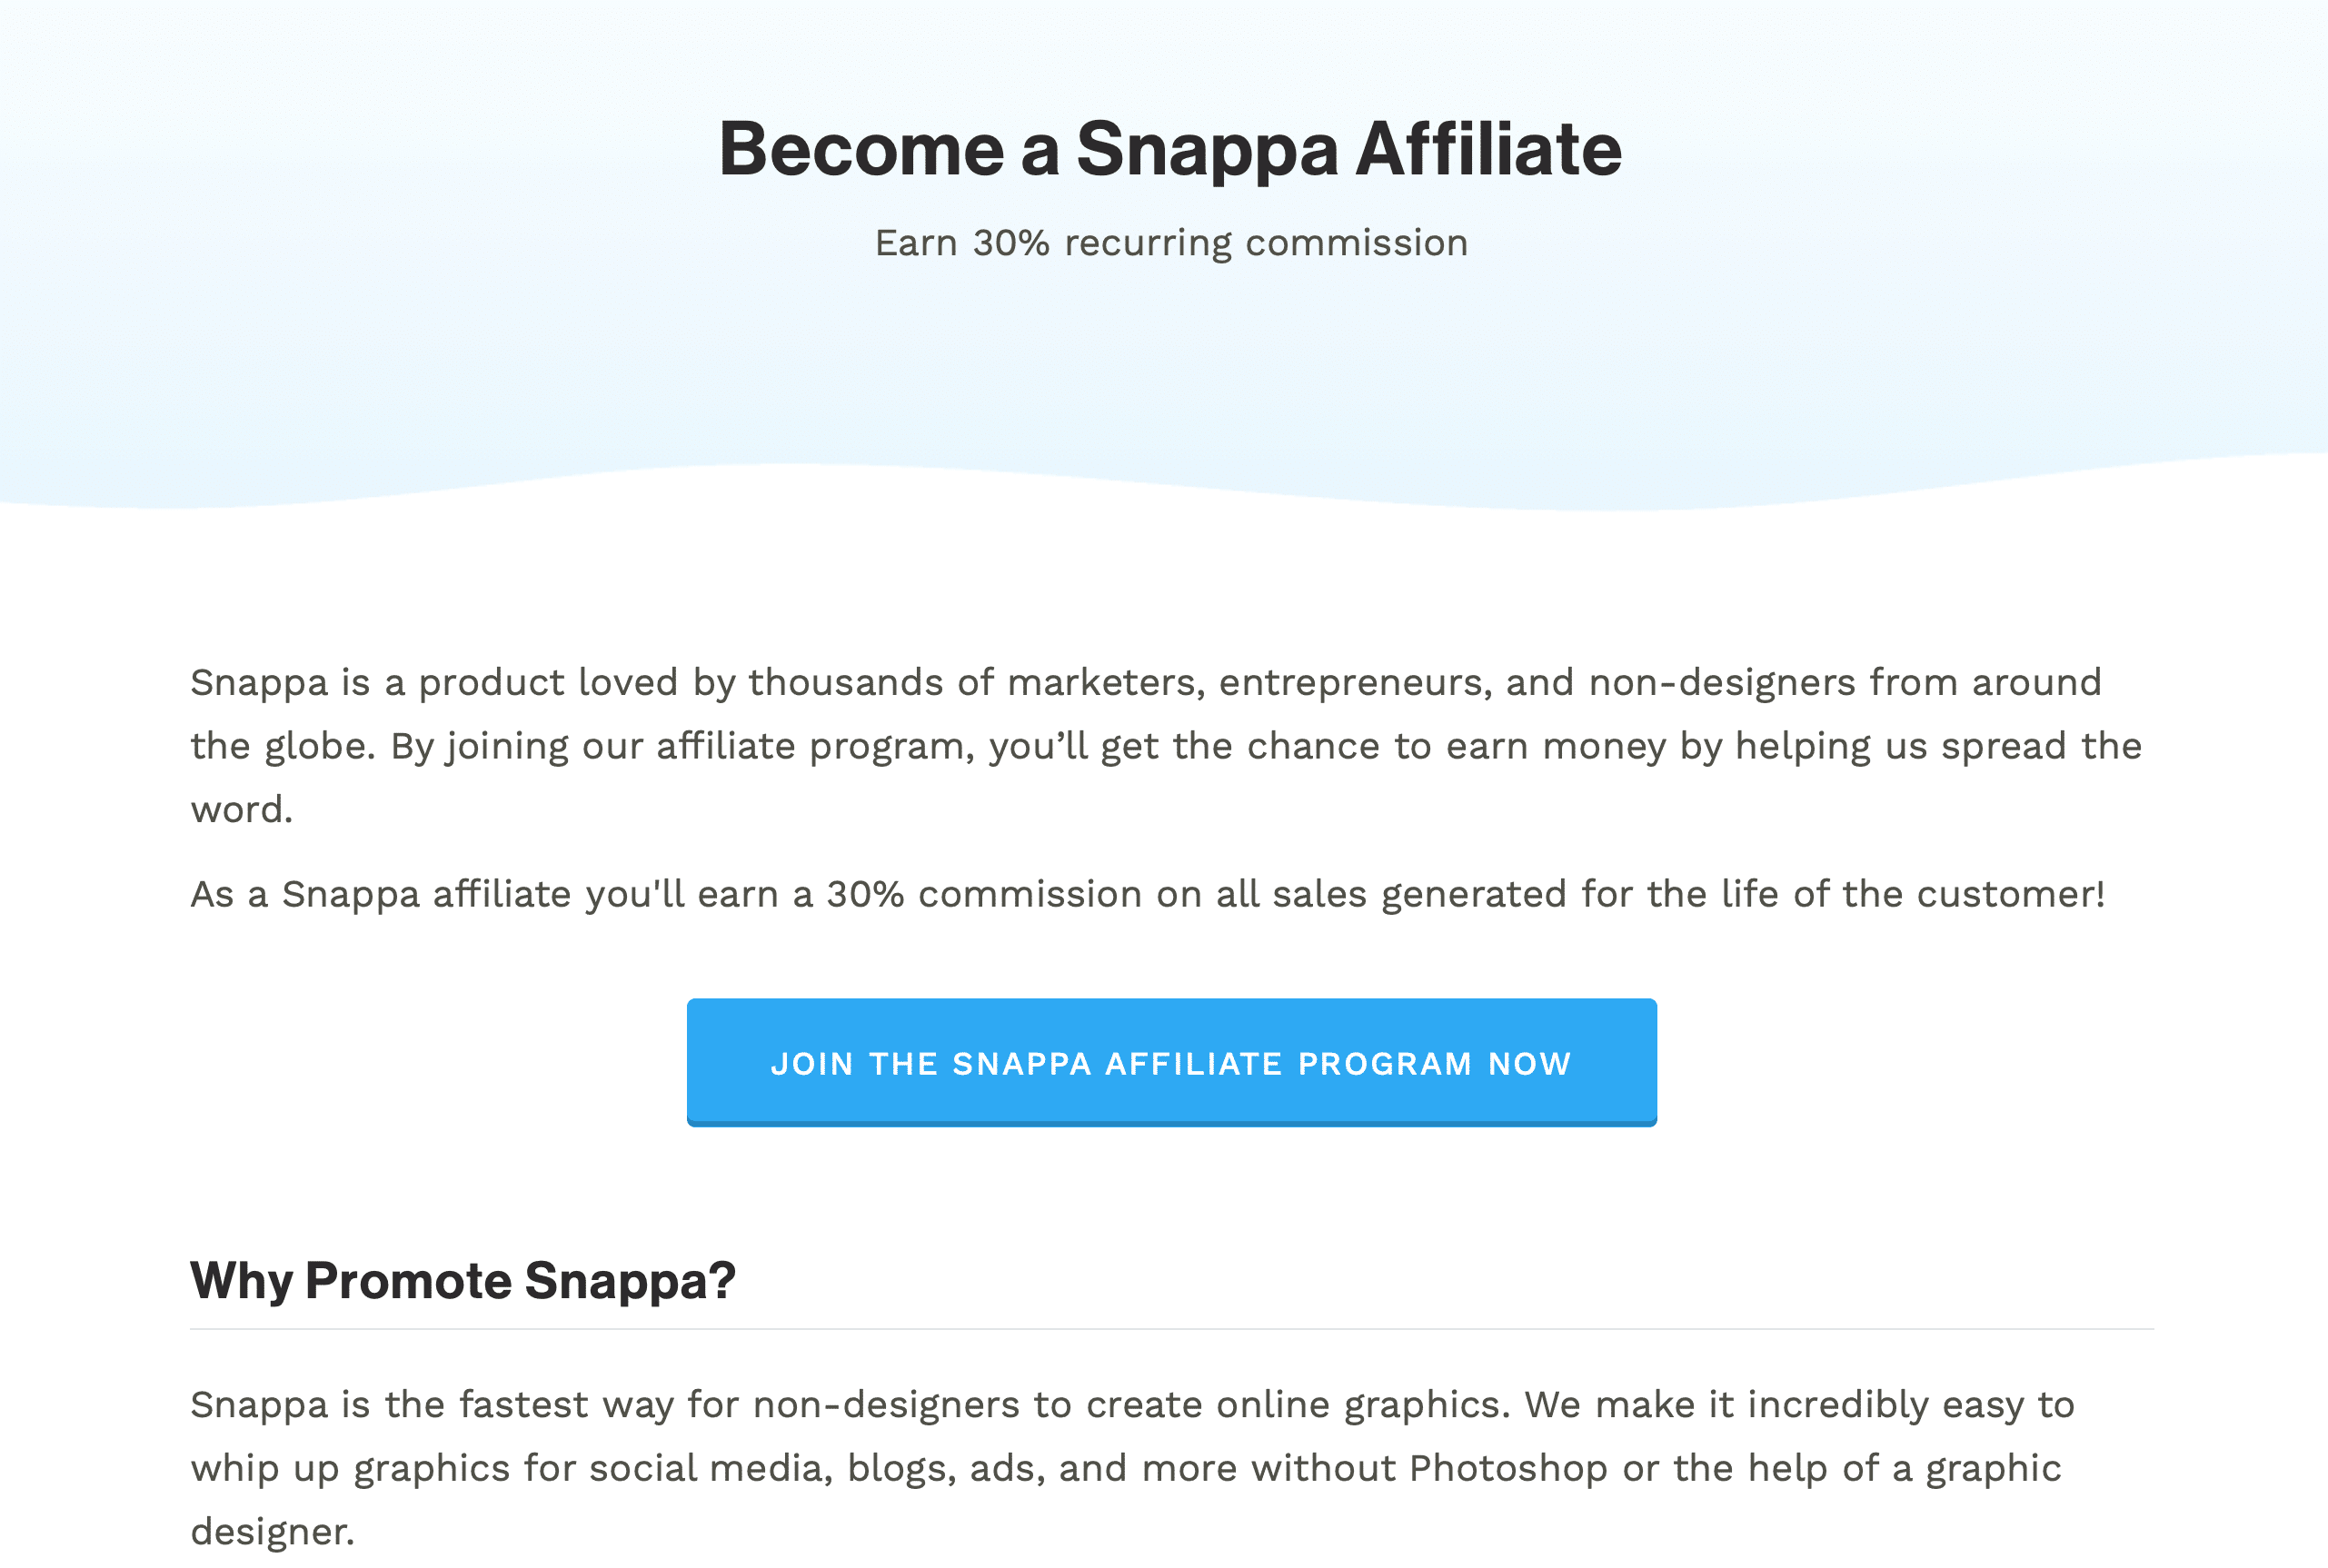 Snappa-affiliate-program-img-03